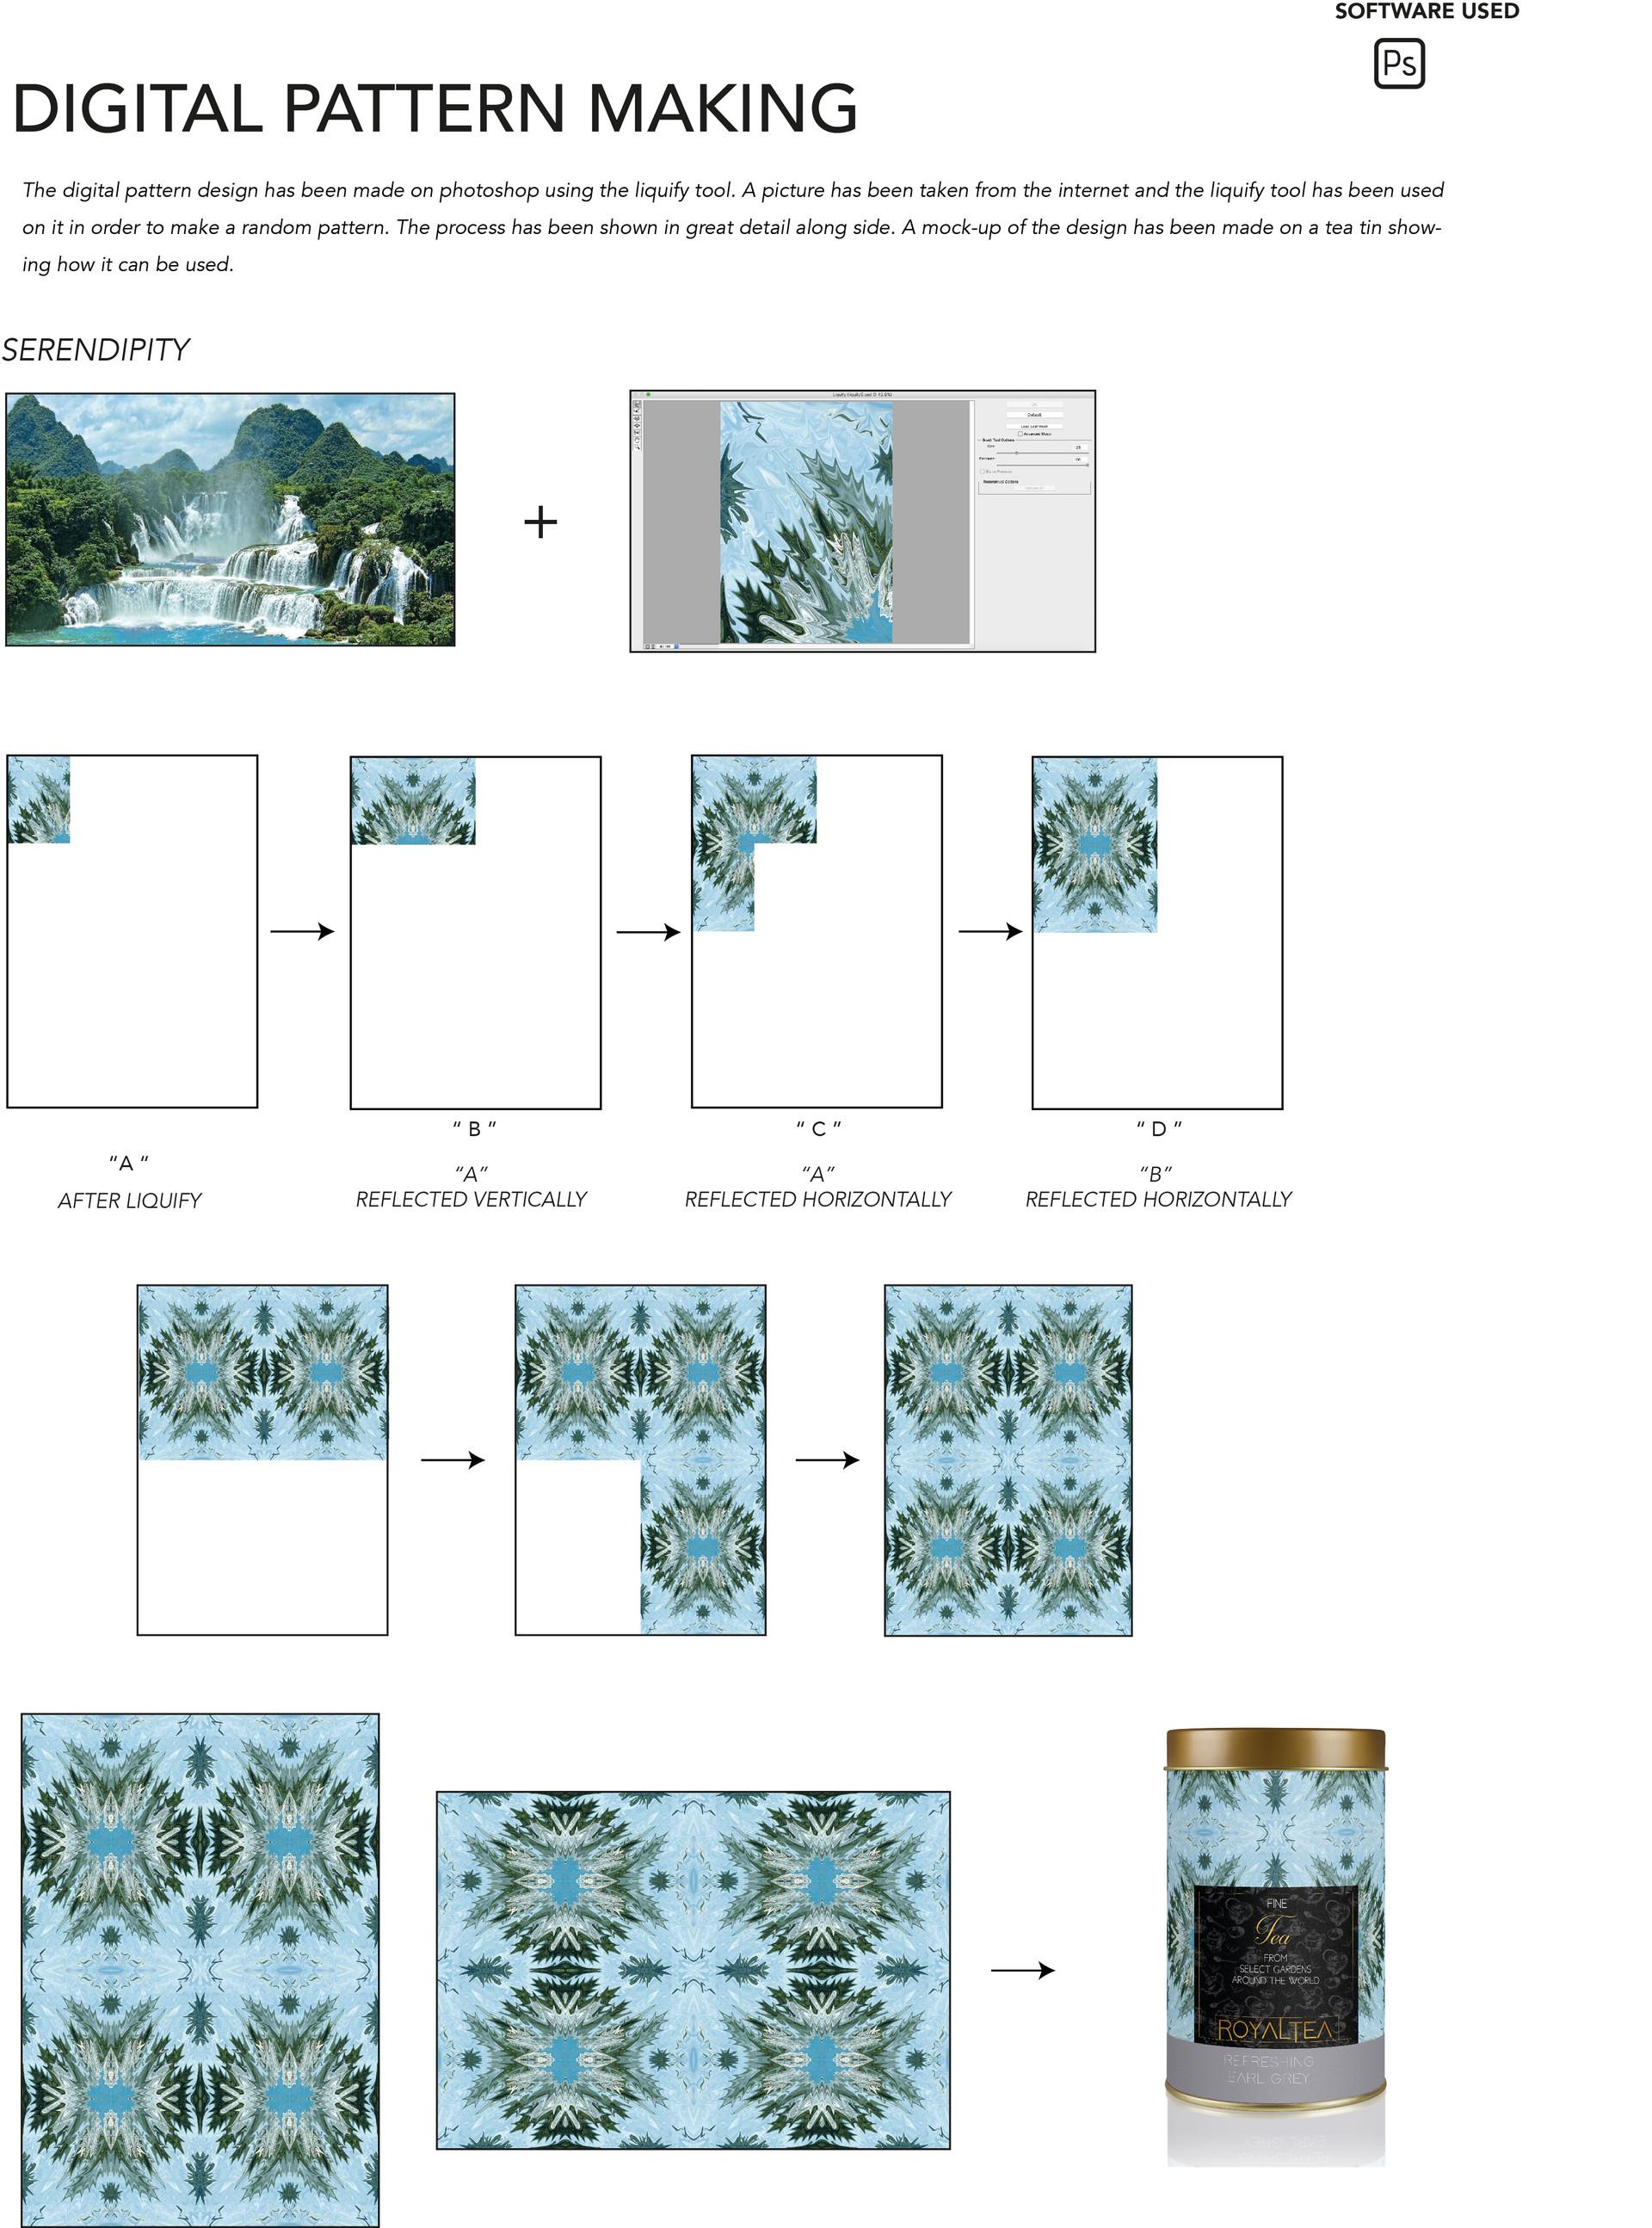 Digital Pattern Making